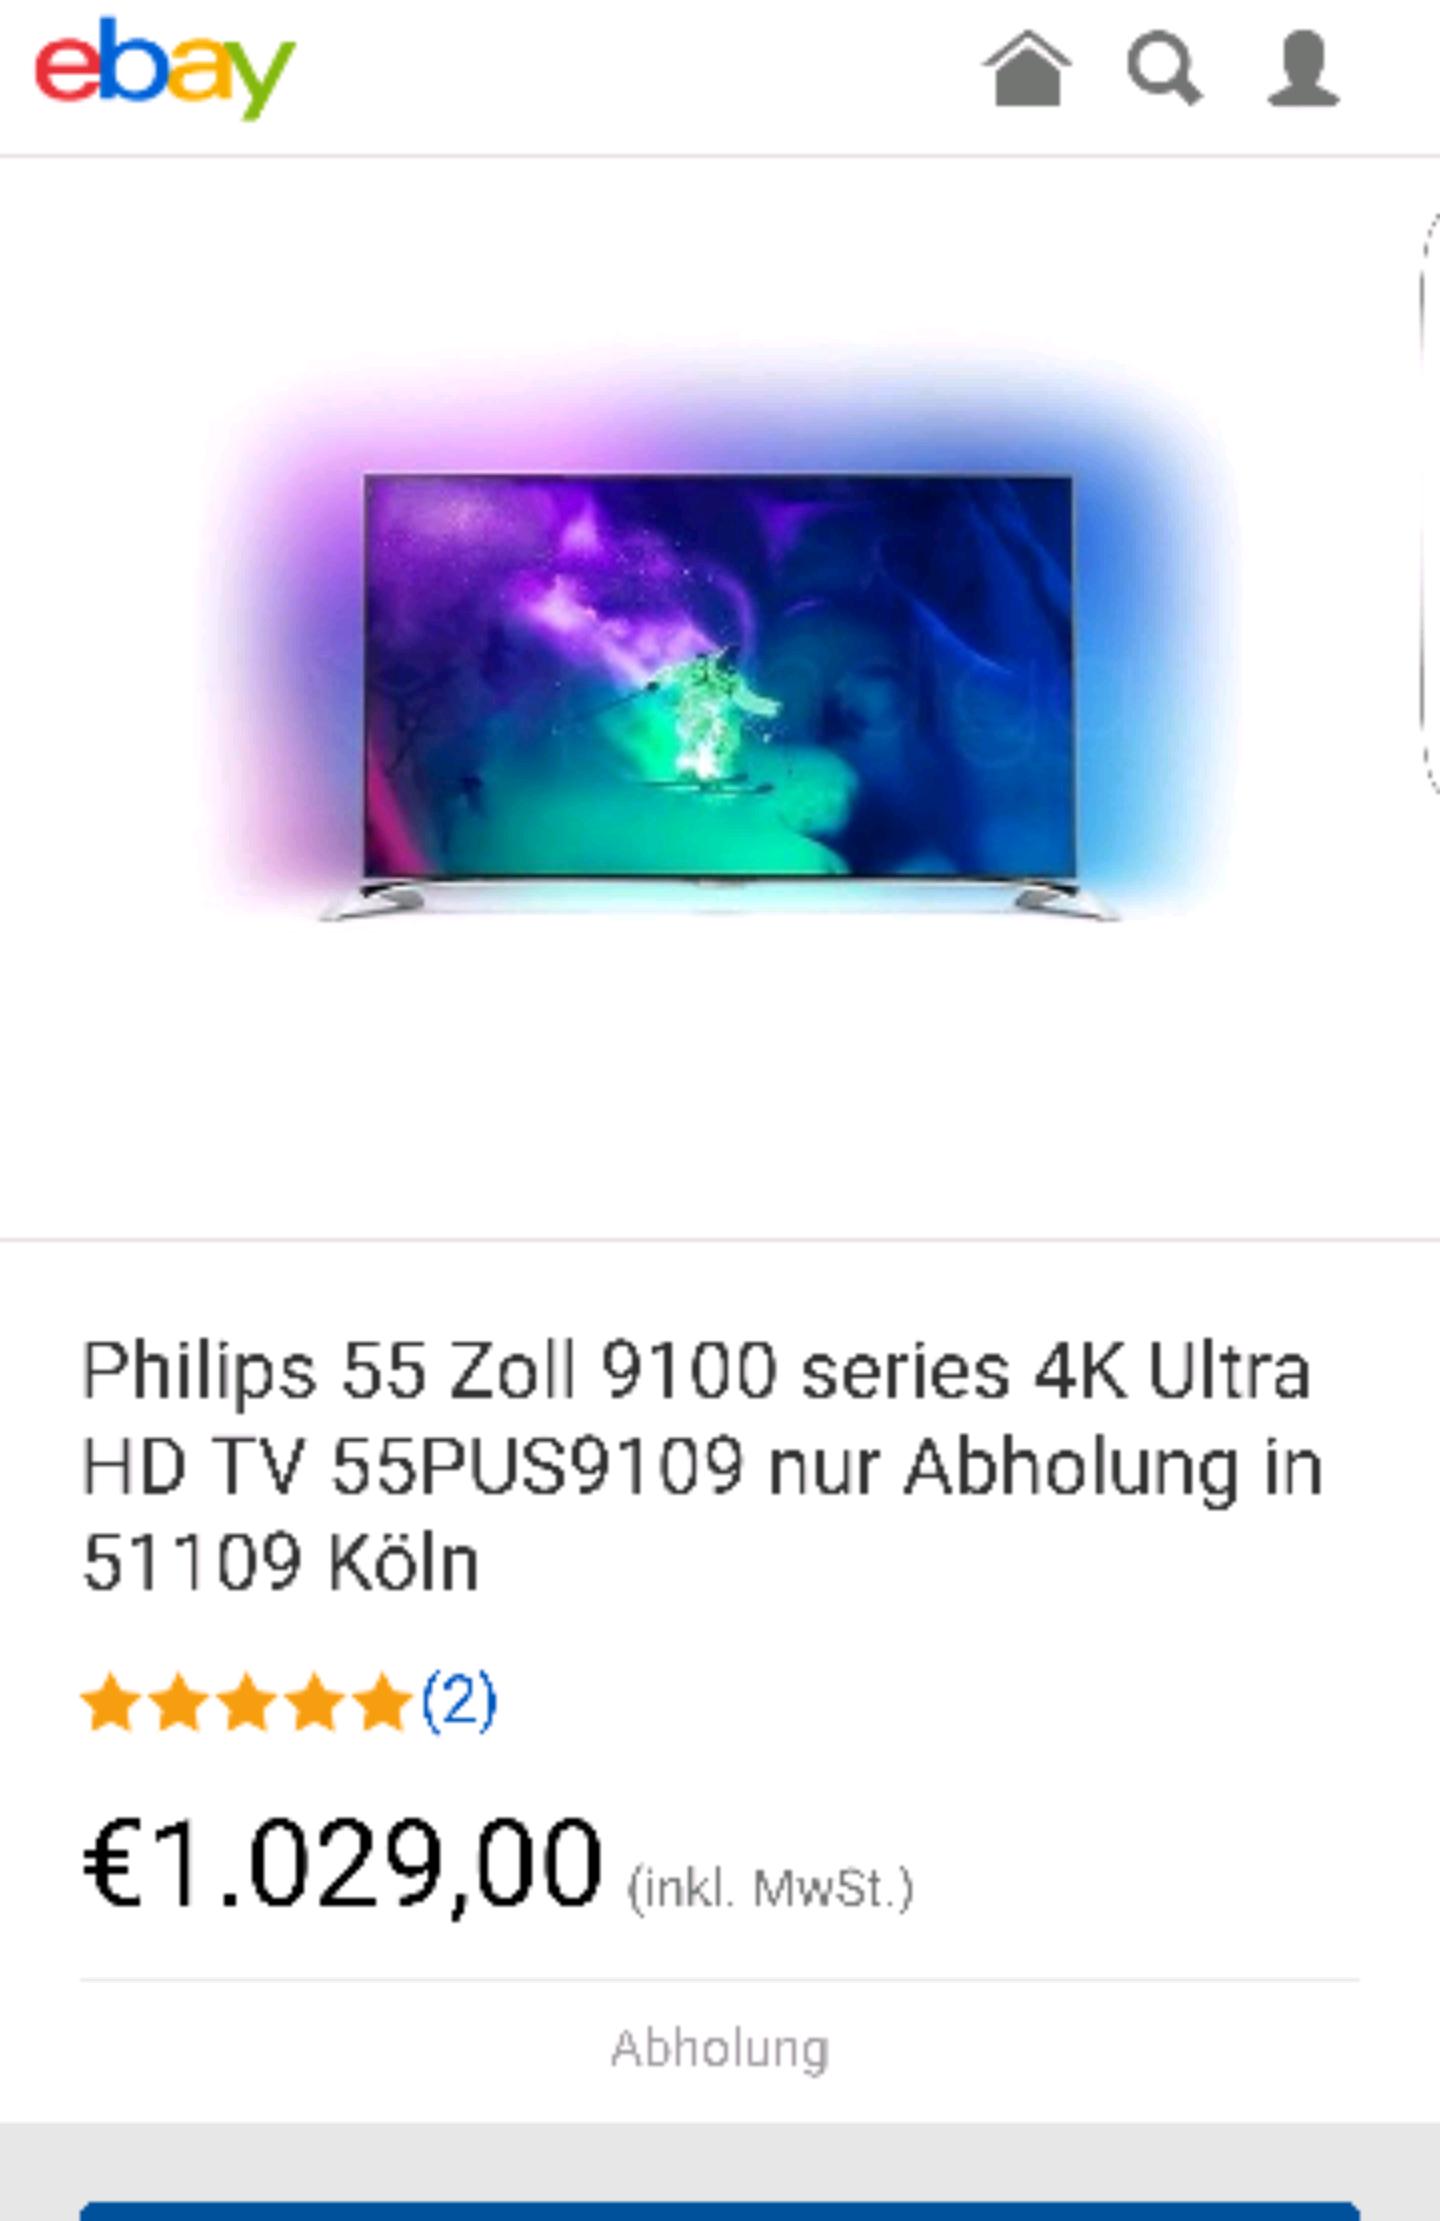 Philips 55 Zoll 9100 Series 4K Ultra HD TV 55PUS9109 mit Abholung in Köln